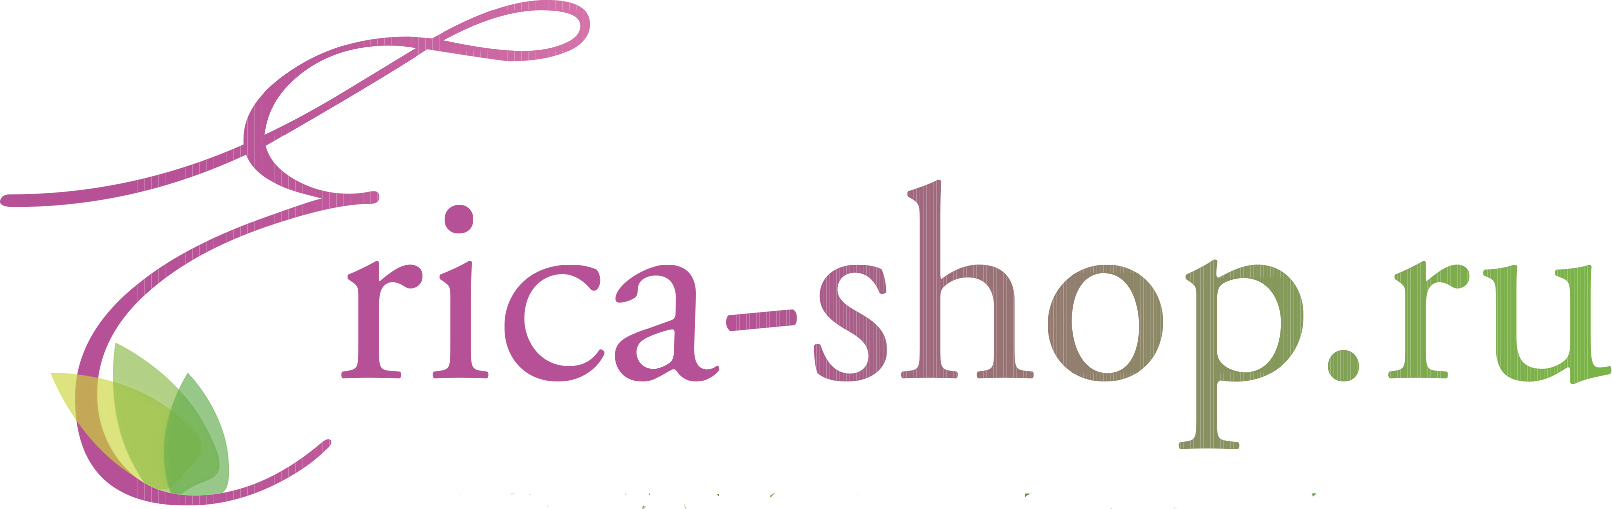 erica-shop